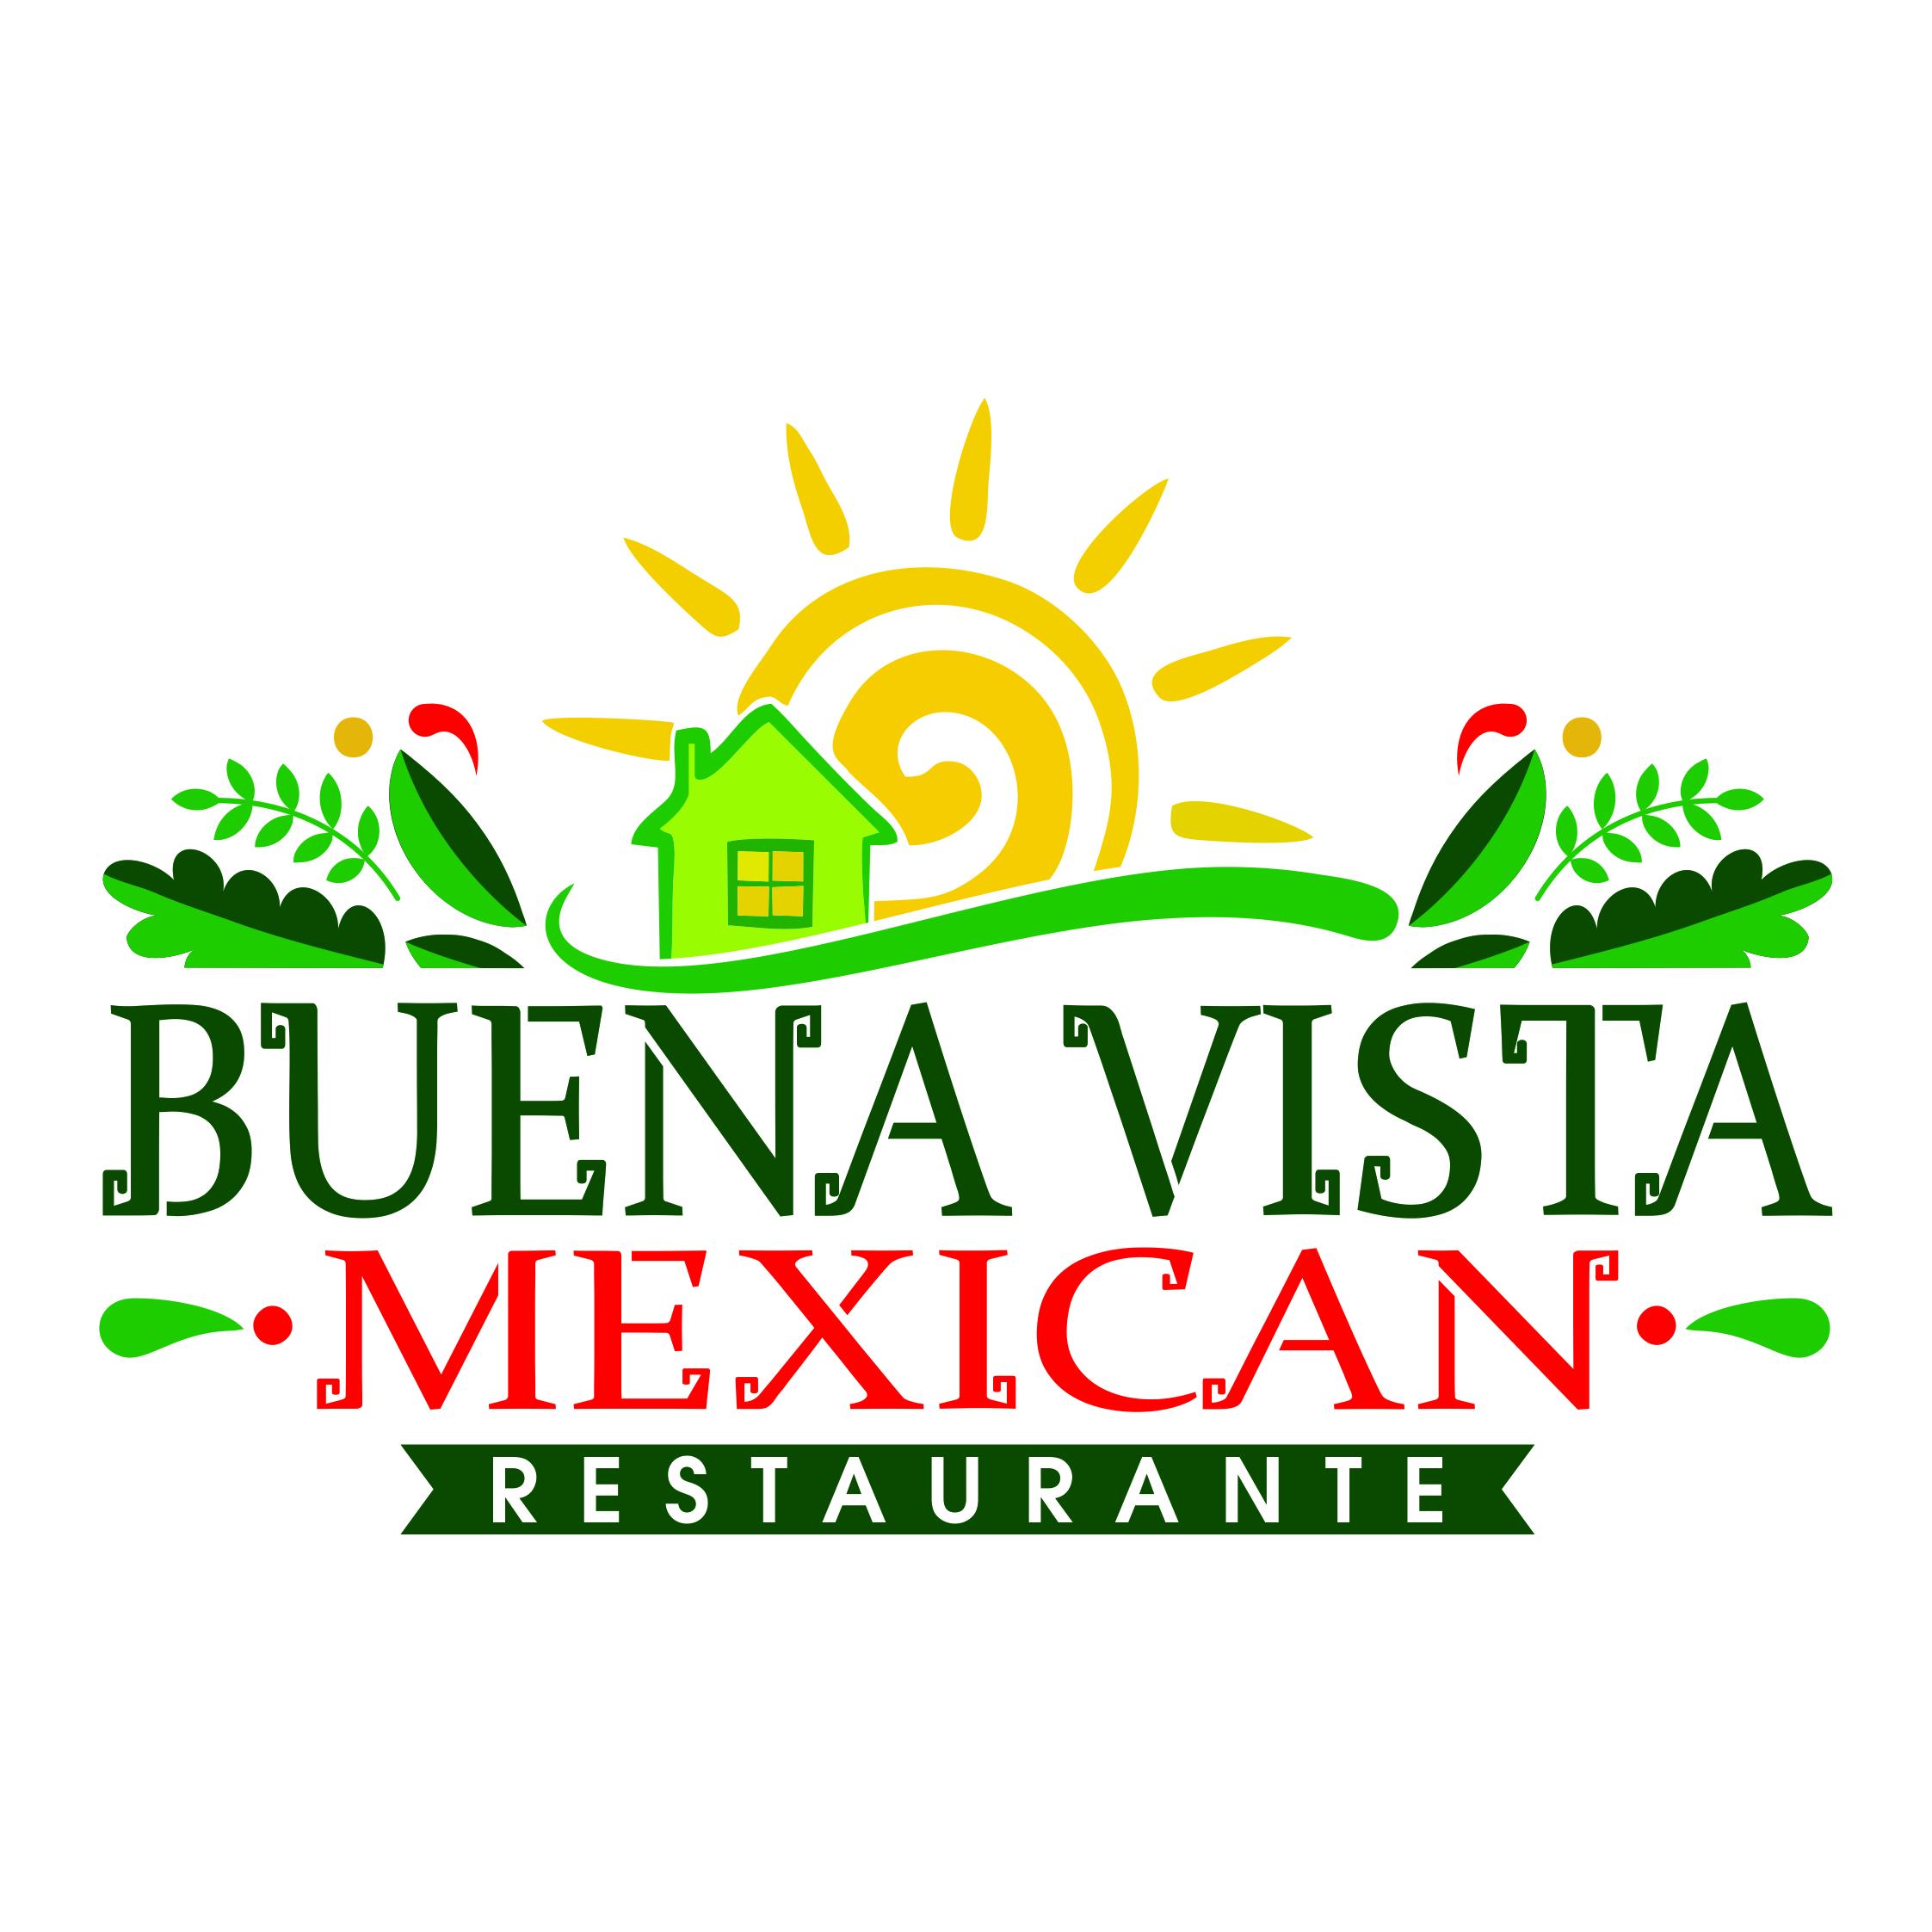 https://secureservercdn.net/198.71.233.72/u6t.3a8.myftpupload.com/wp-content/uploads/2020/08/BUENA-VISTA-MEXICAN-Logo-1.jpg